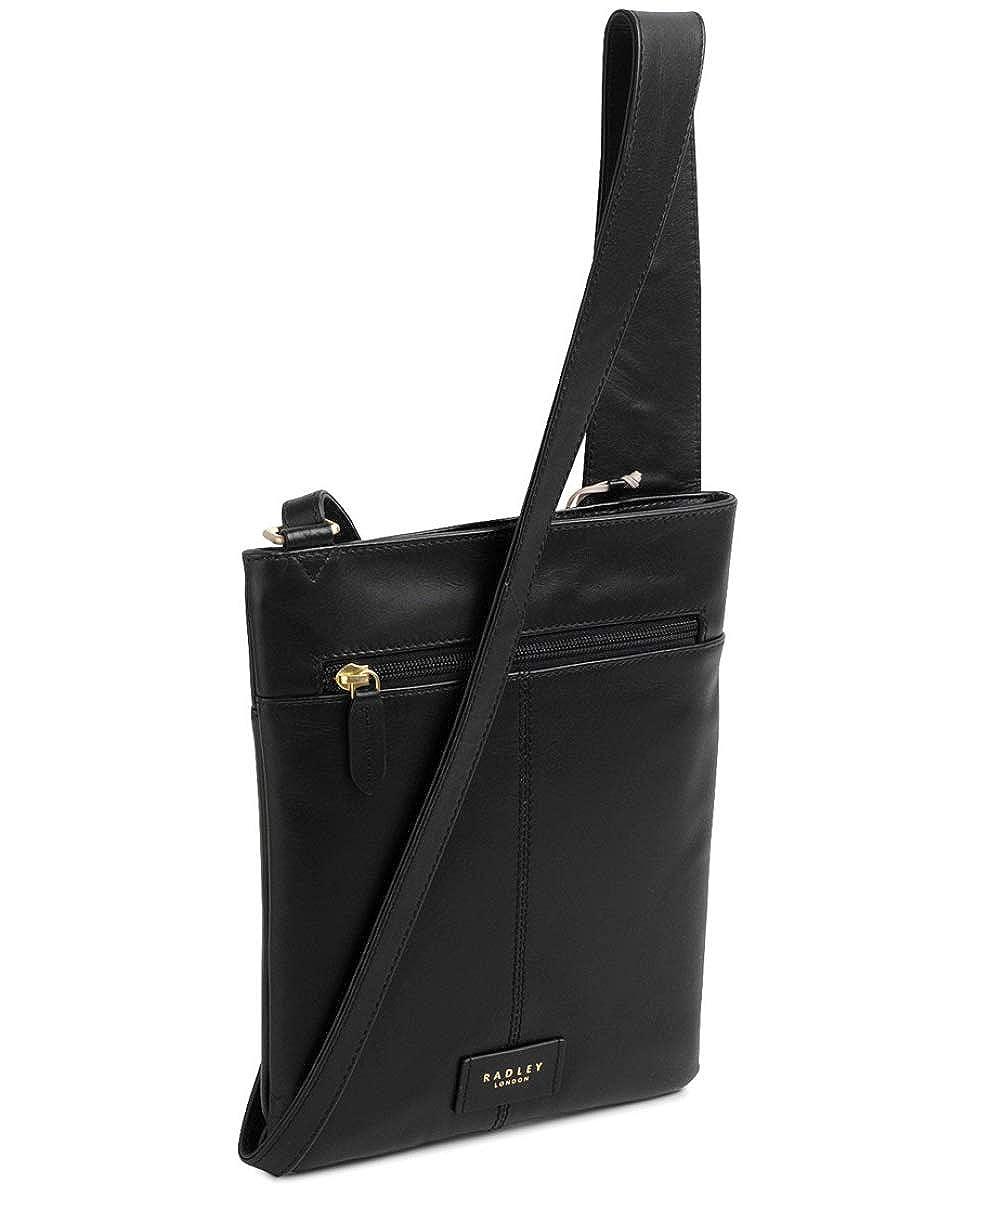 505851e24a3a44 RADLEY 'Pocket Bag' Medium Black Leather Across Body Bag - RRP £119:  Amazon.co.uk: Clothing